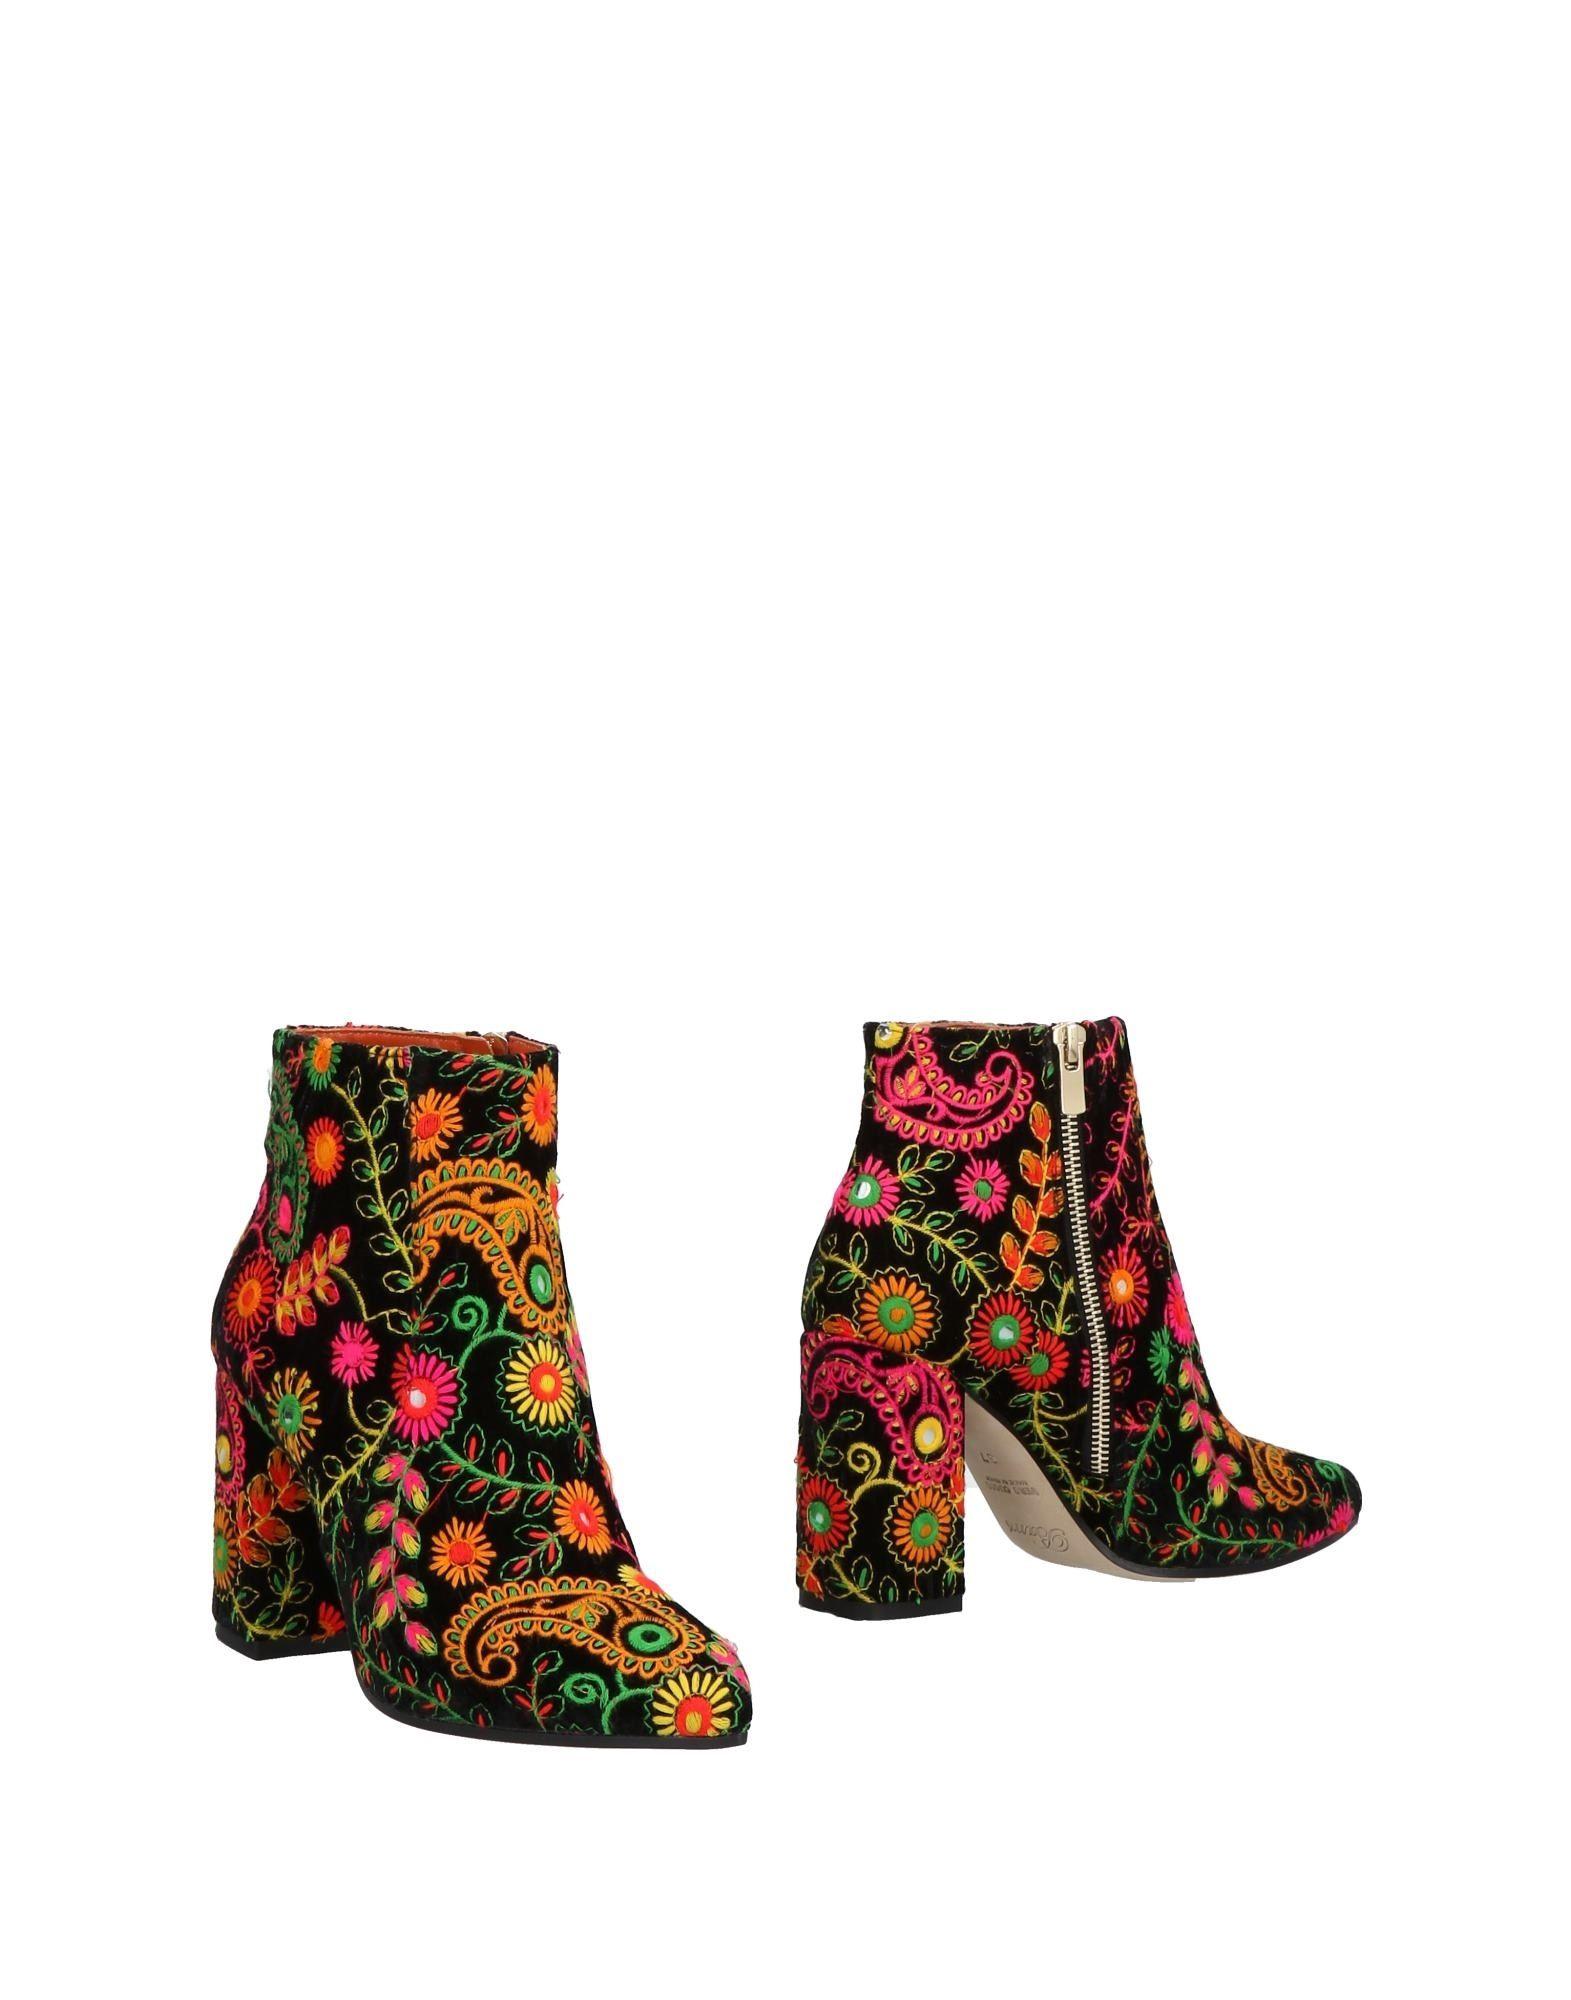 Rabatt Schuhe Bams Stiefelette  Damen  Stiefelette 11490568MR ade672